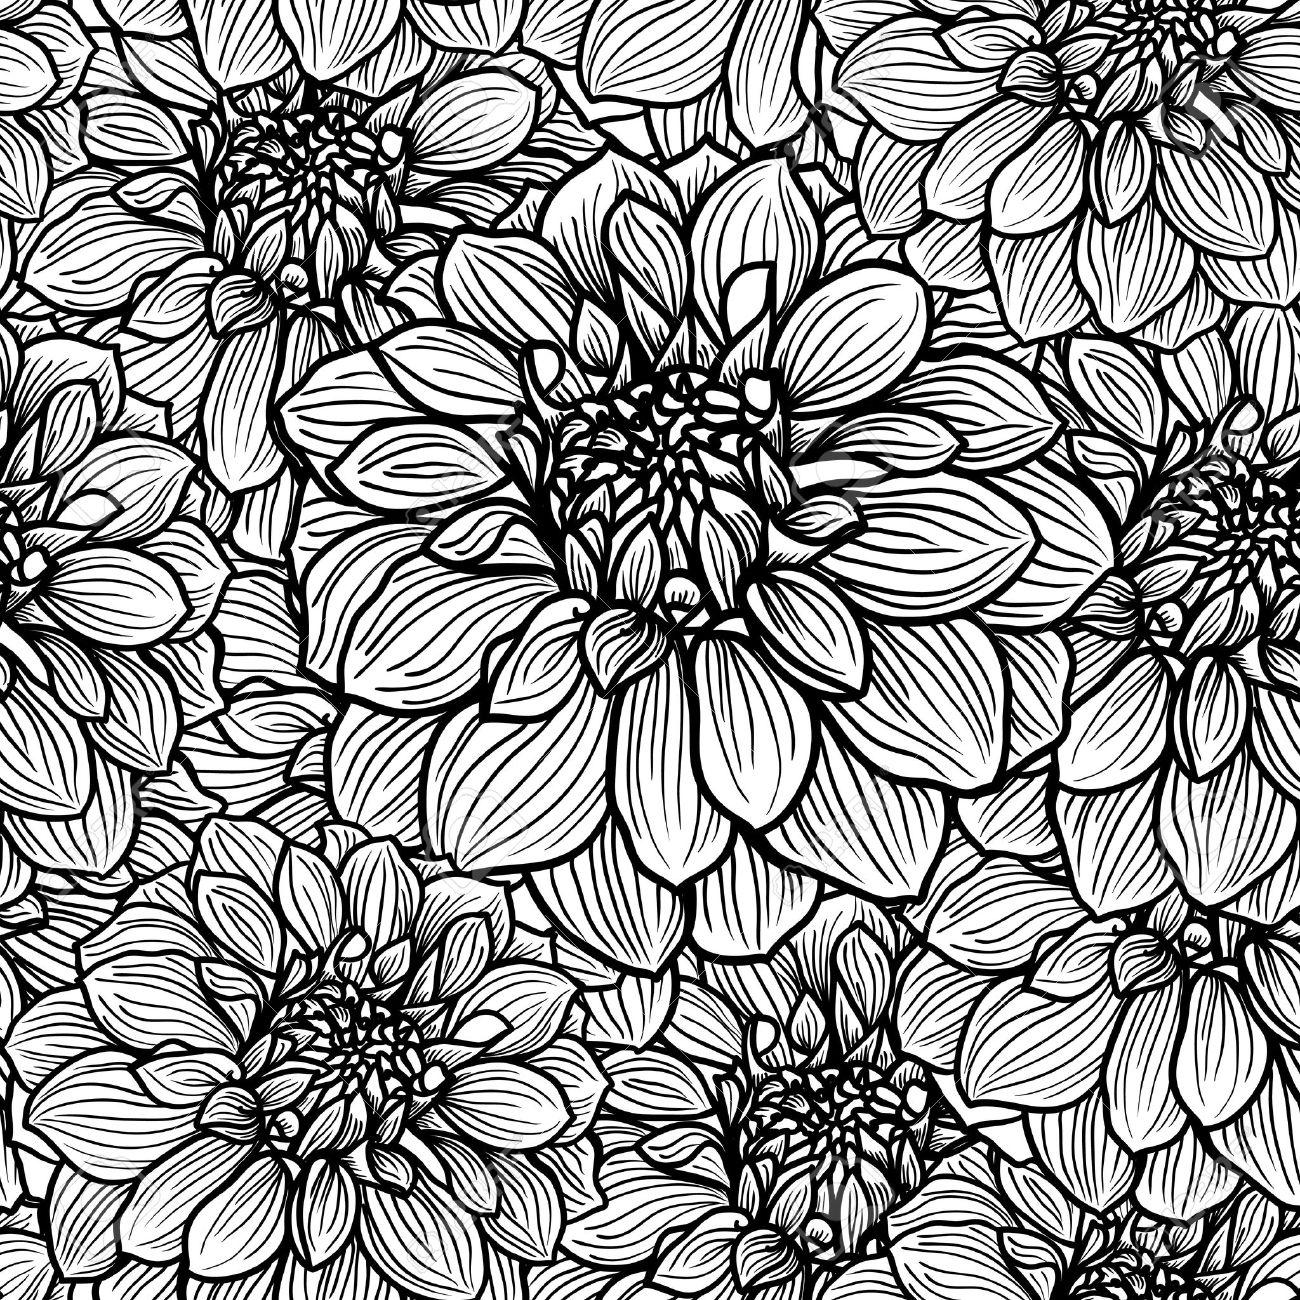 1300x1300 Drawn Background Black And White